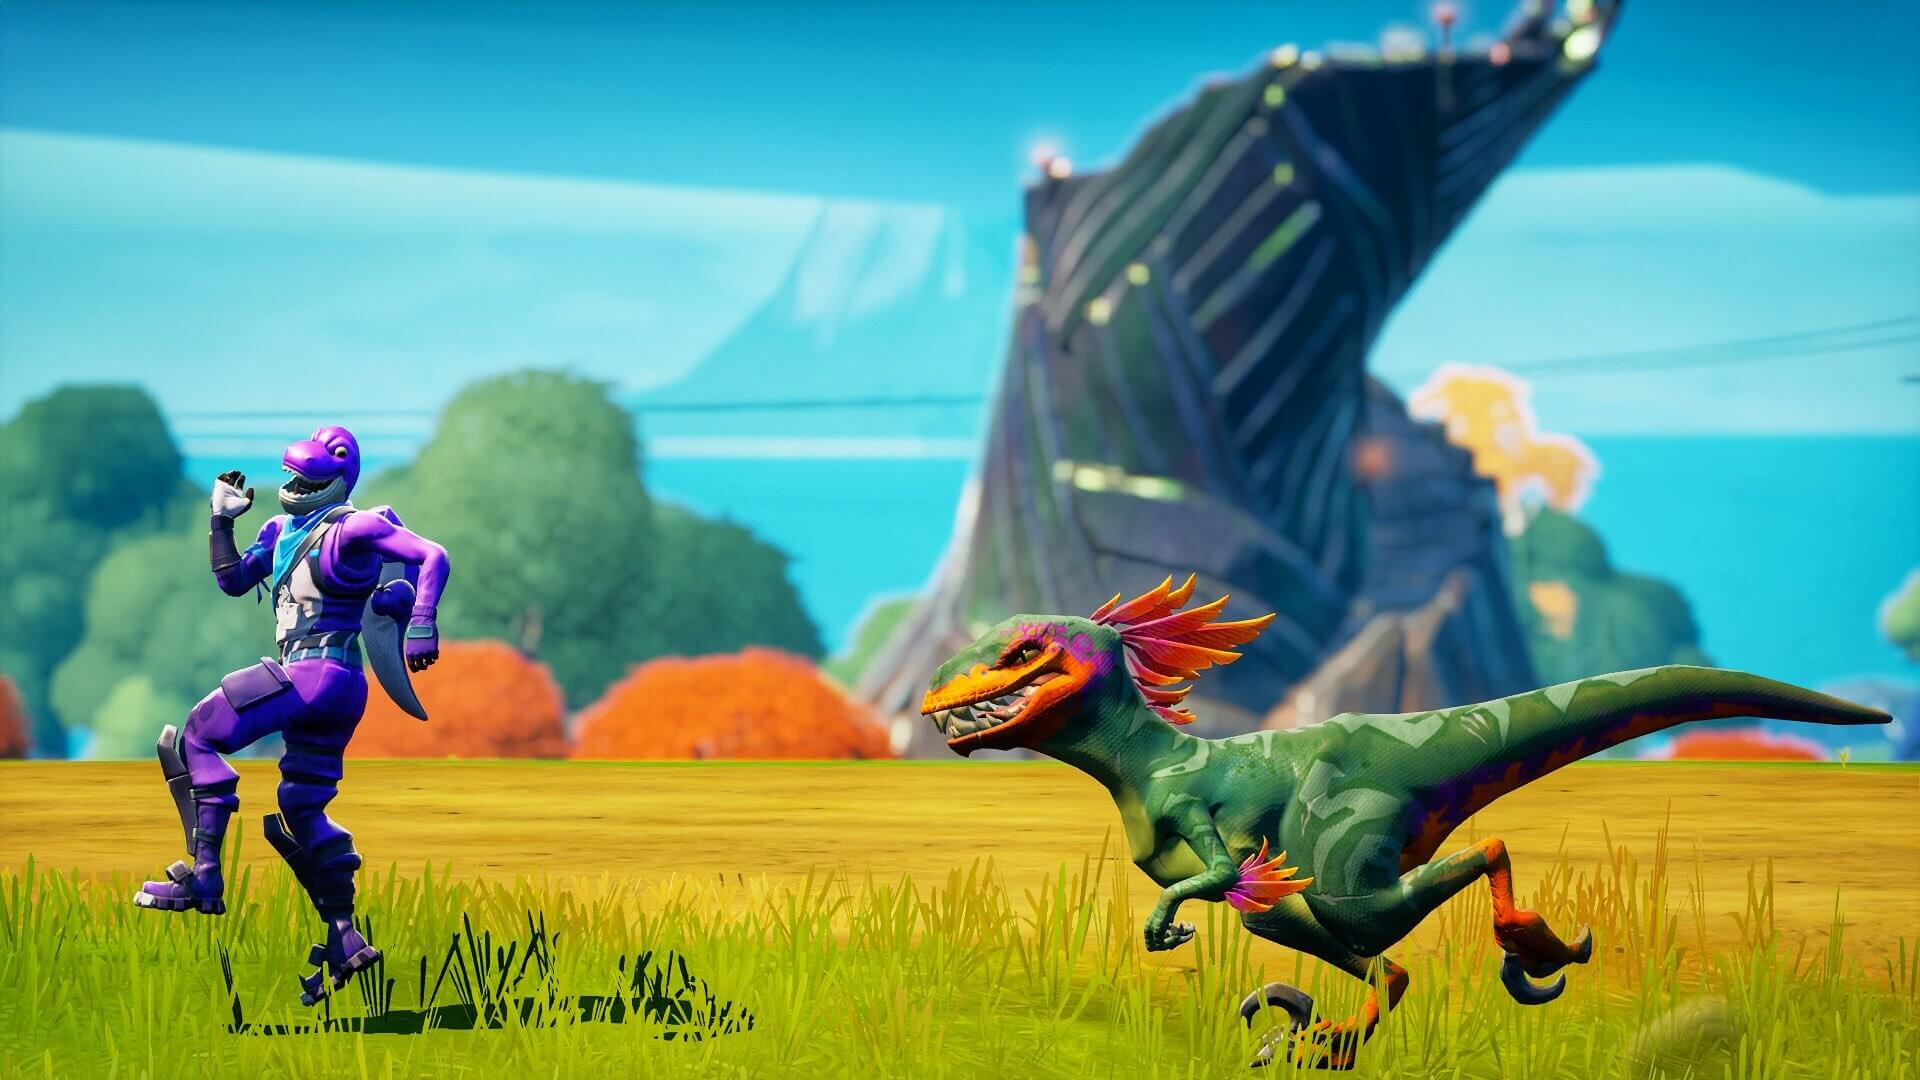 ExclusiveFlexer Raptor Fortography